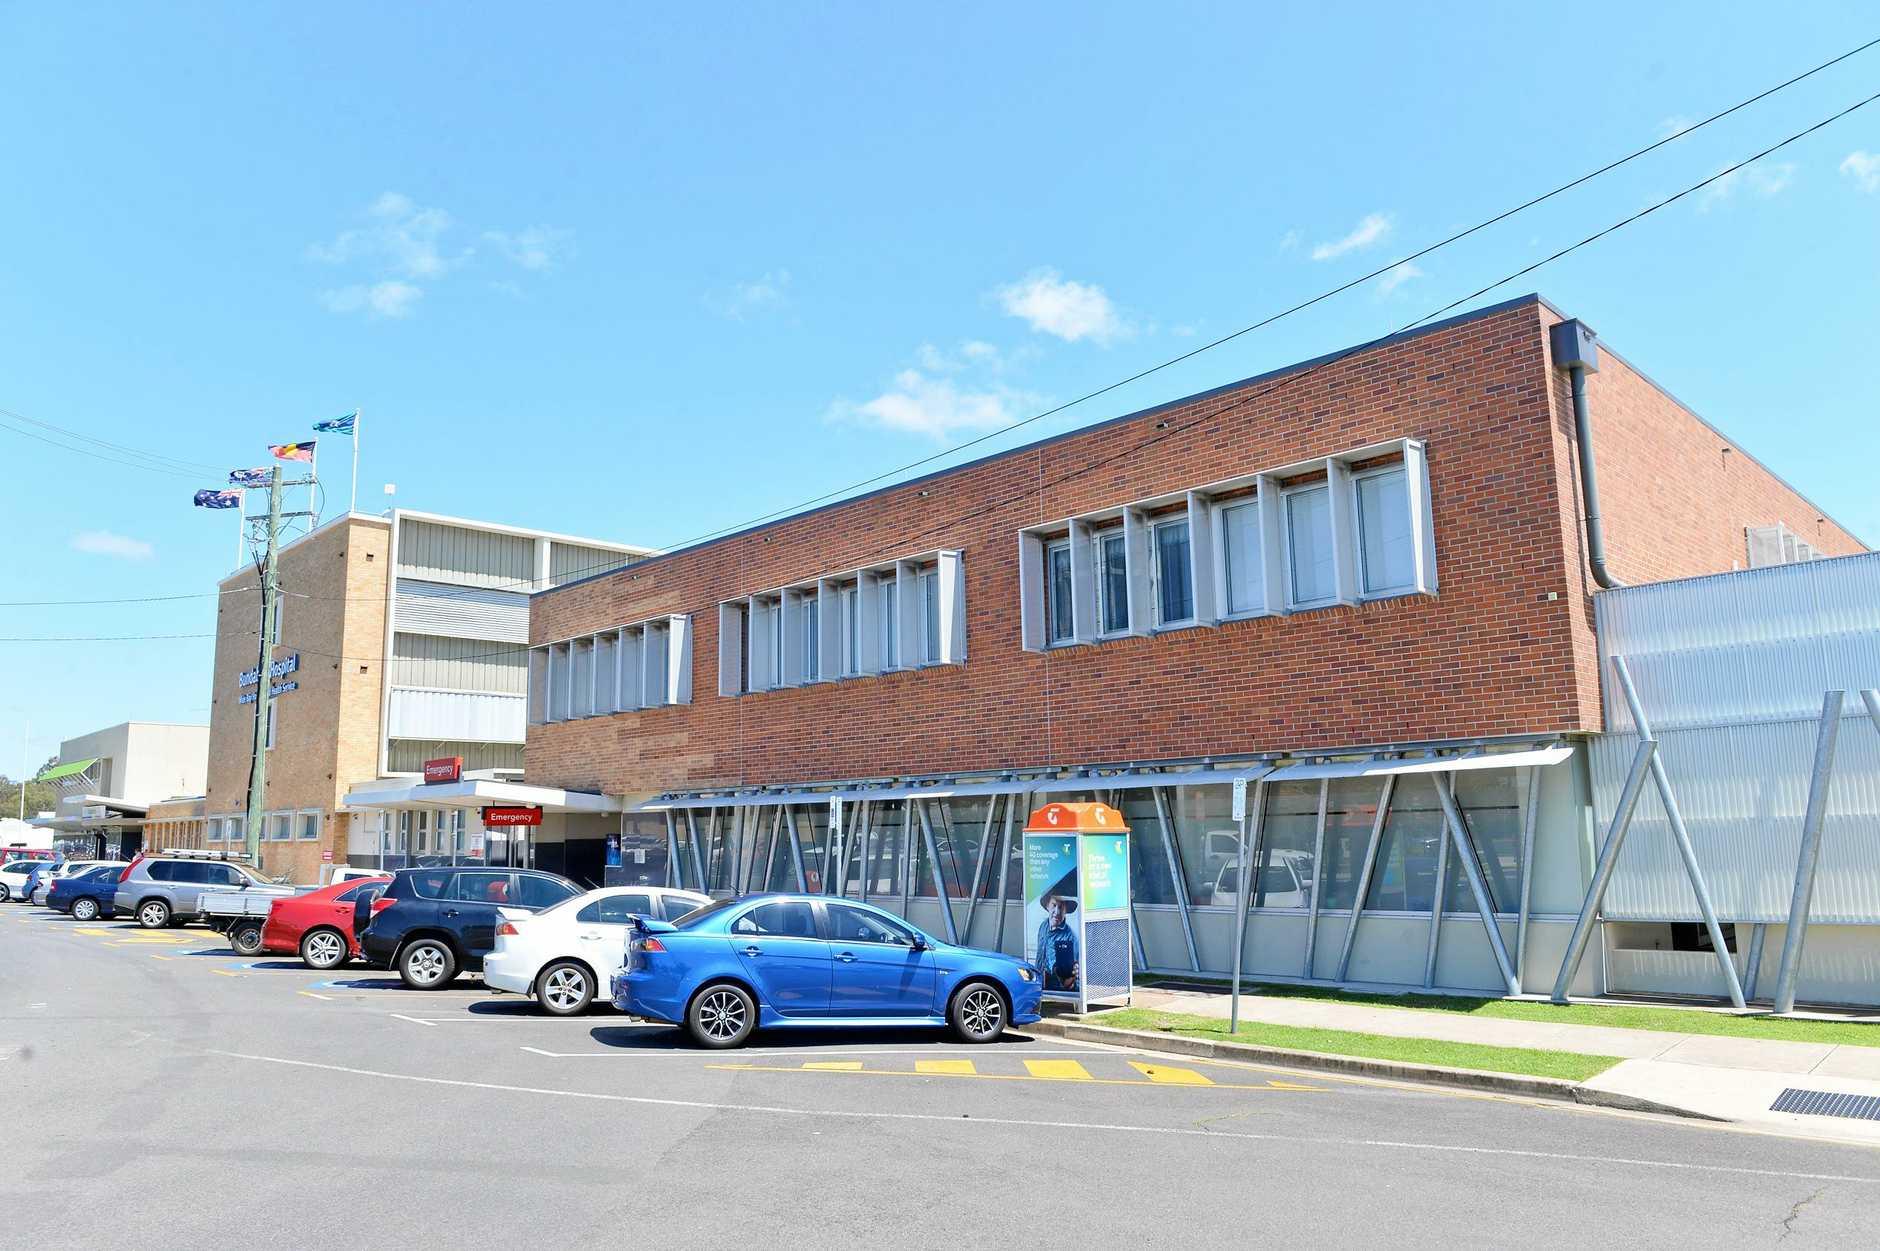 Bundaberg Hospital is on hand for emergencies.